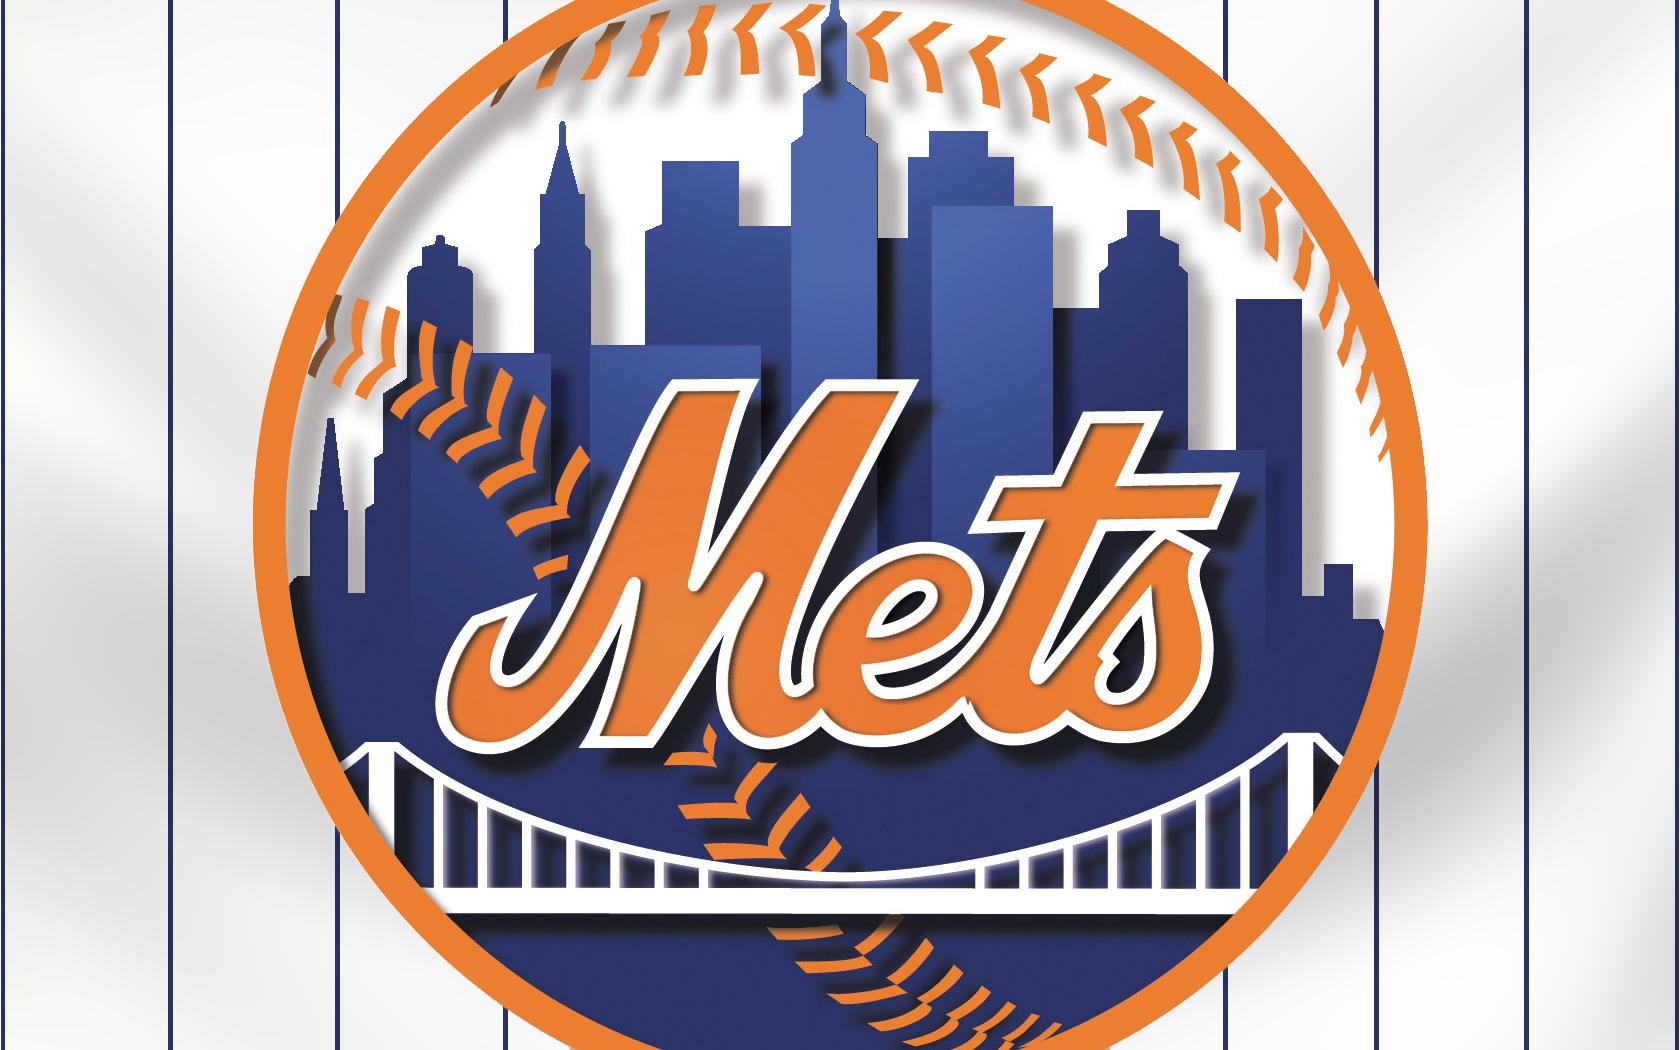 Mets Logo Wallpaper Simple mets by monkeybiziu